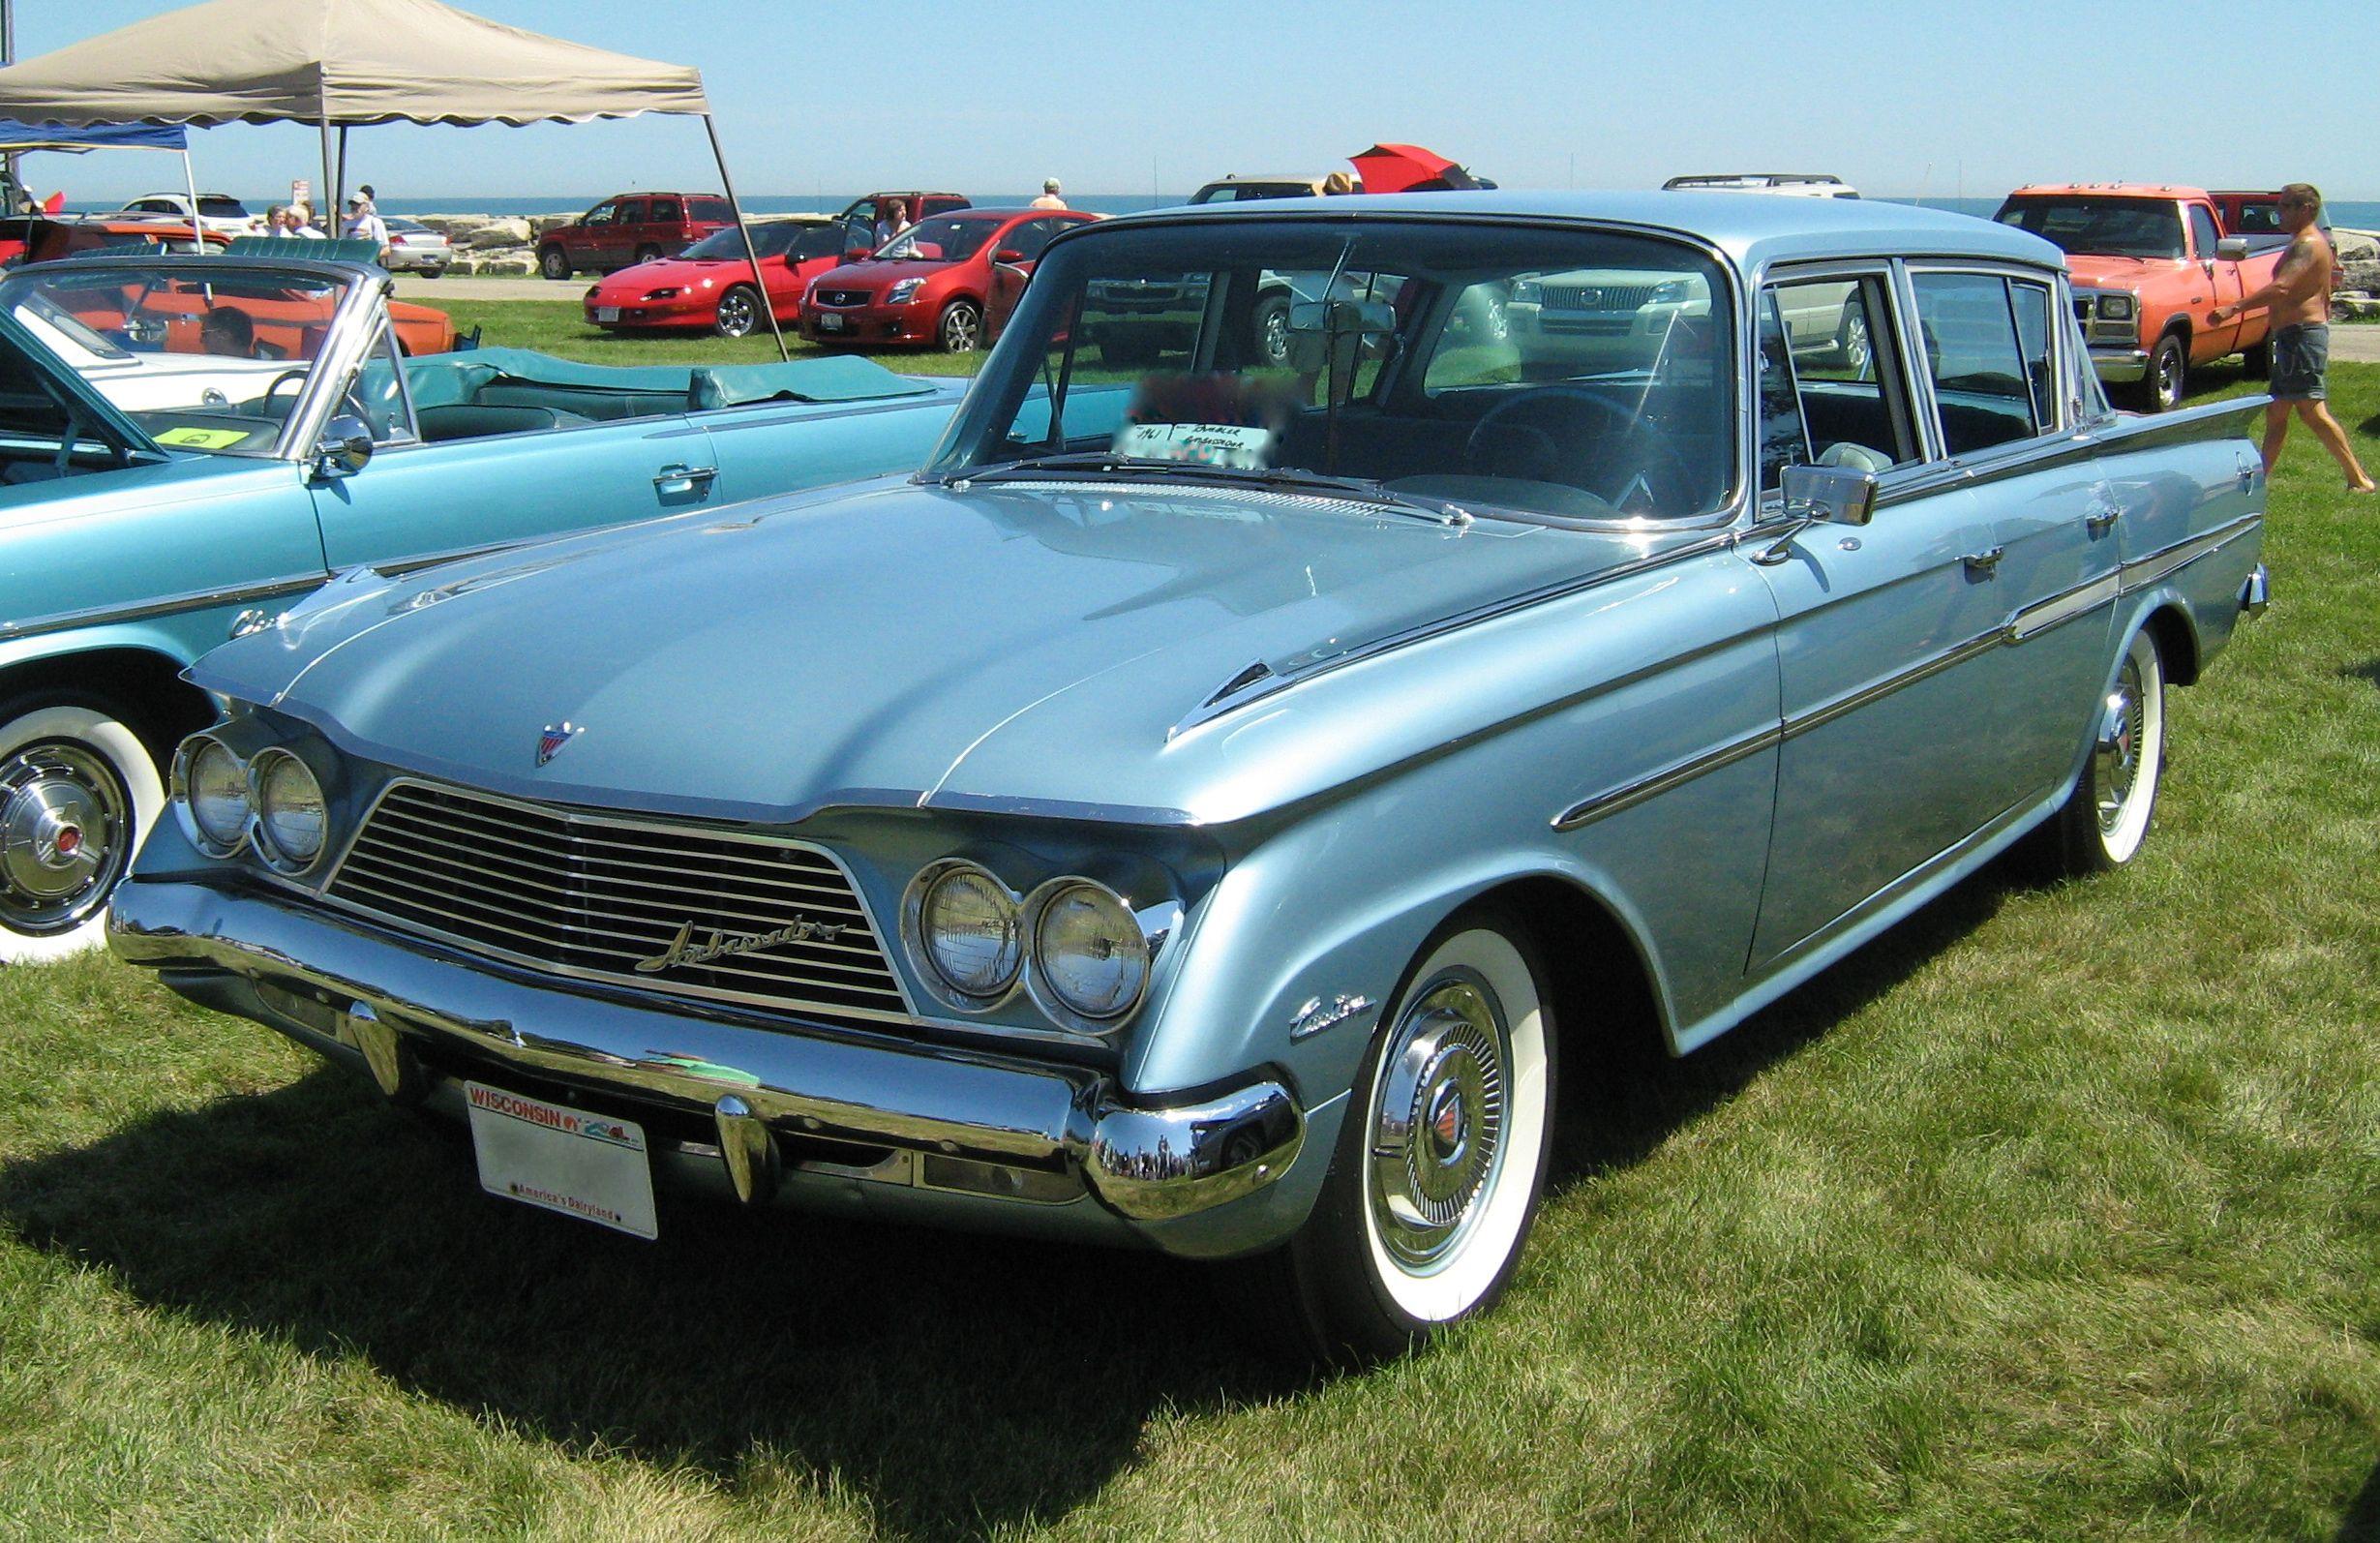 1961 Rambler Ambassador Amc Vintage Muscle Cars Classic Cars Trucks